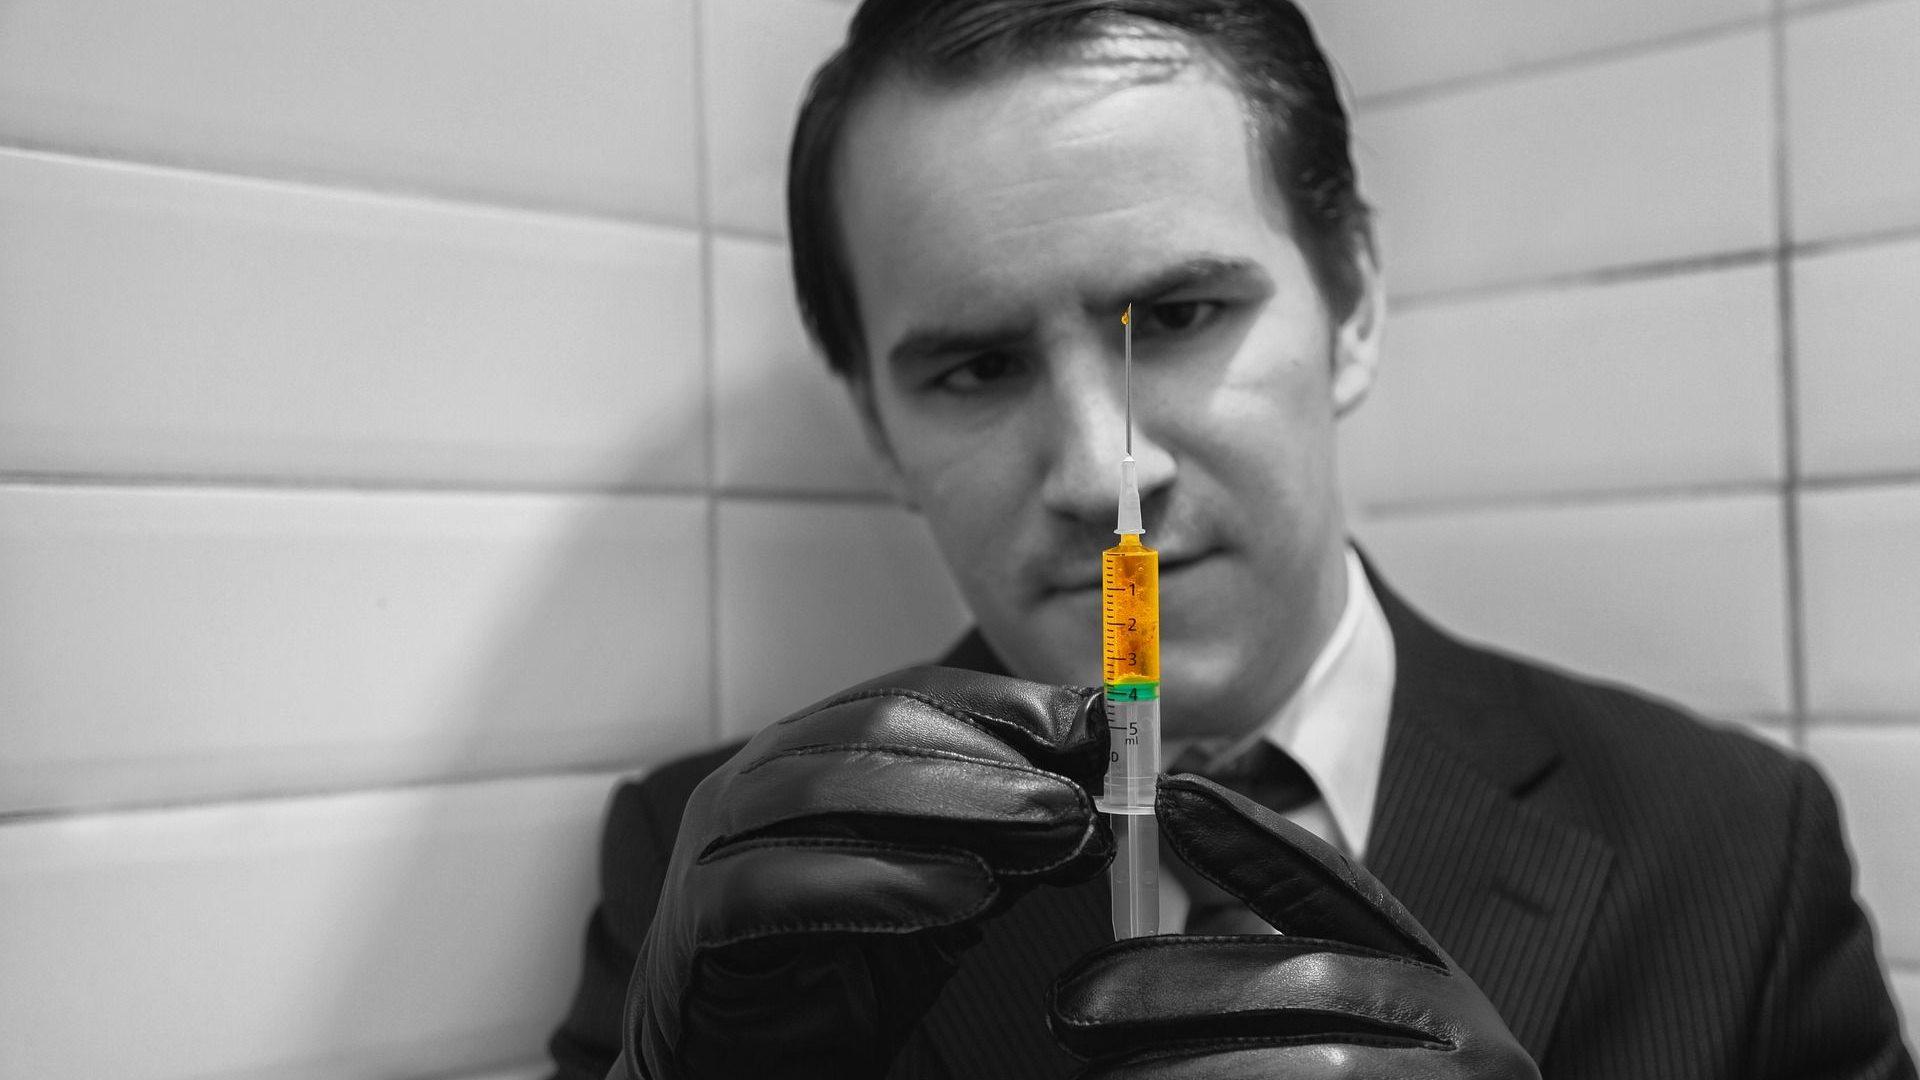 Impfpasszwang in deutschen Schulen